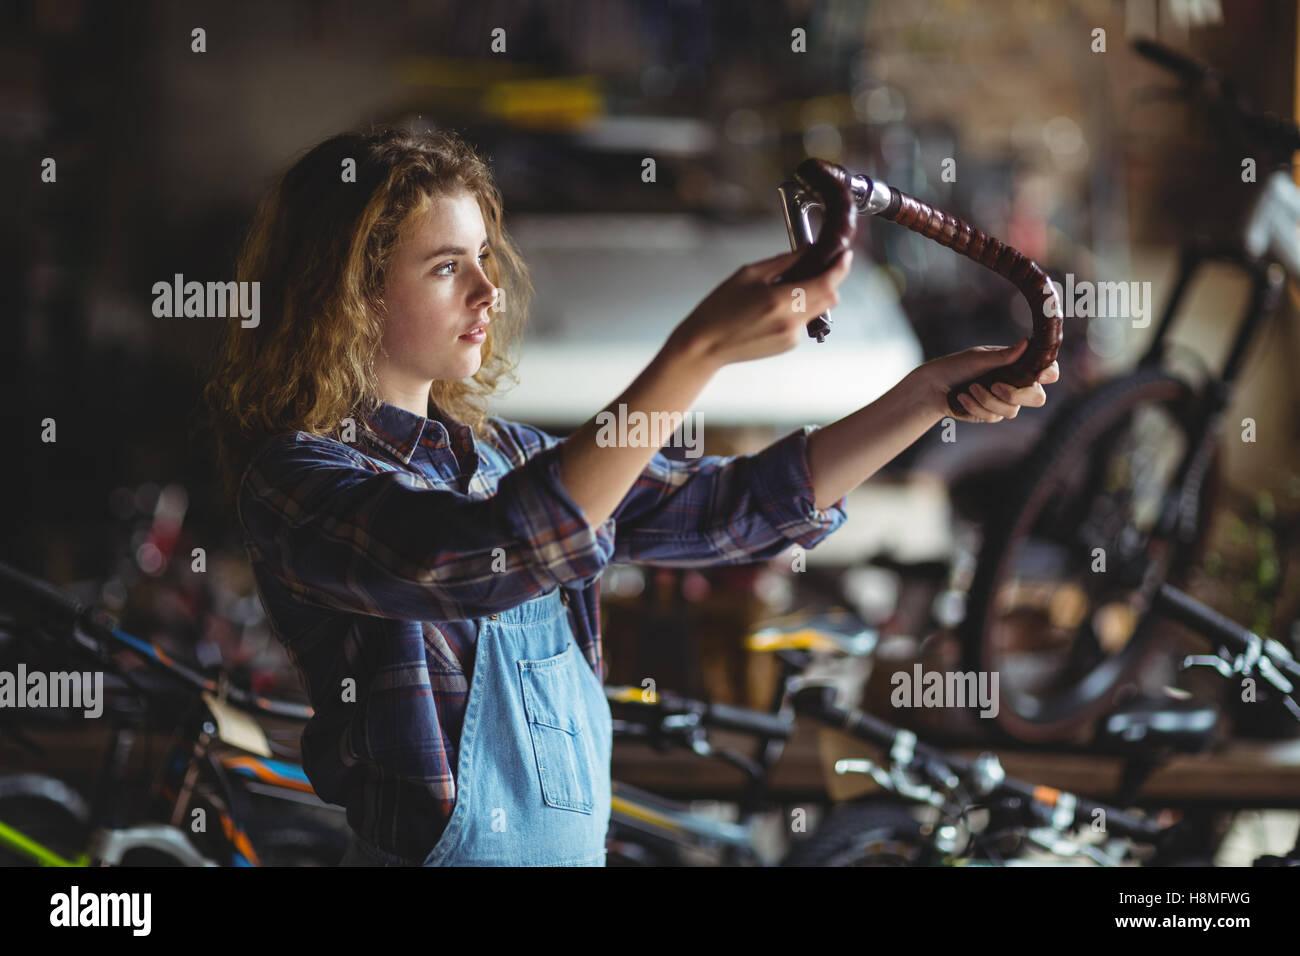 Mechanic examining a bicycle handle bar - Stock Image